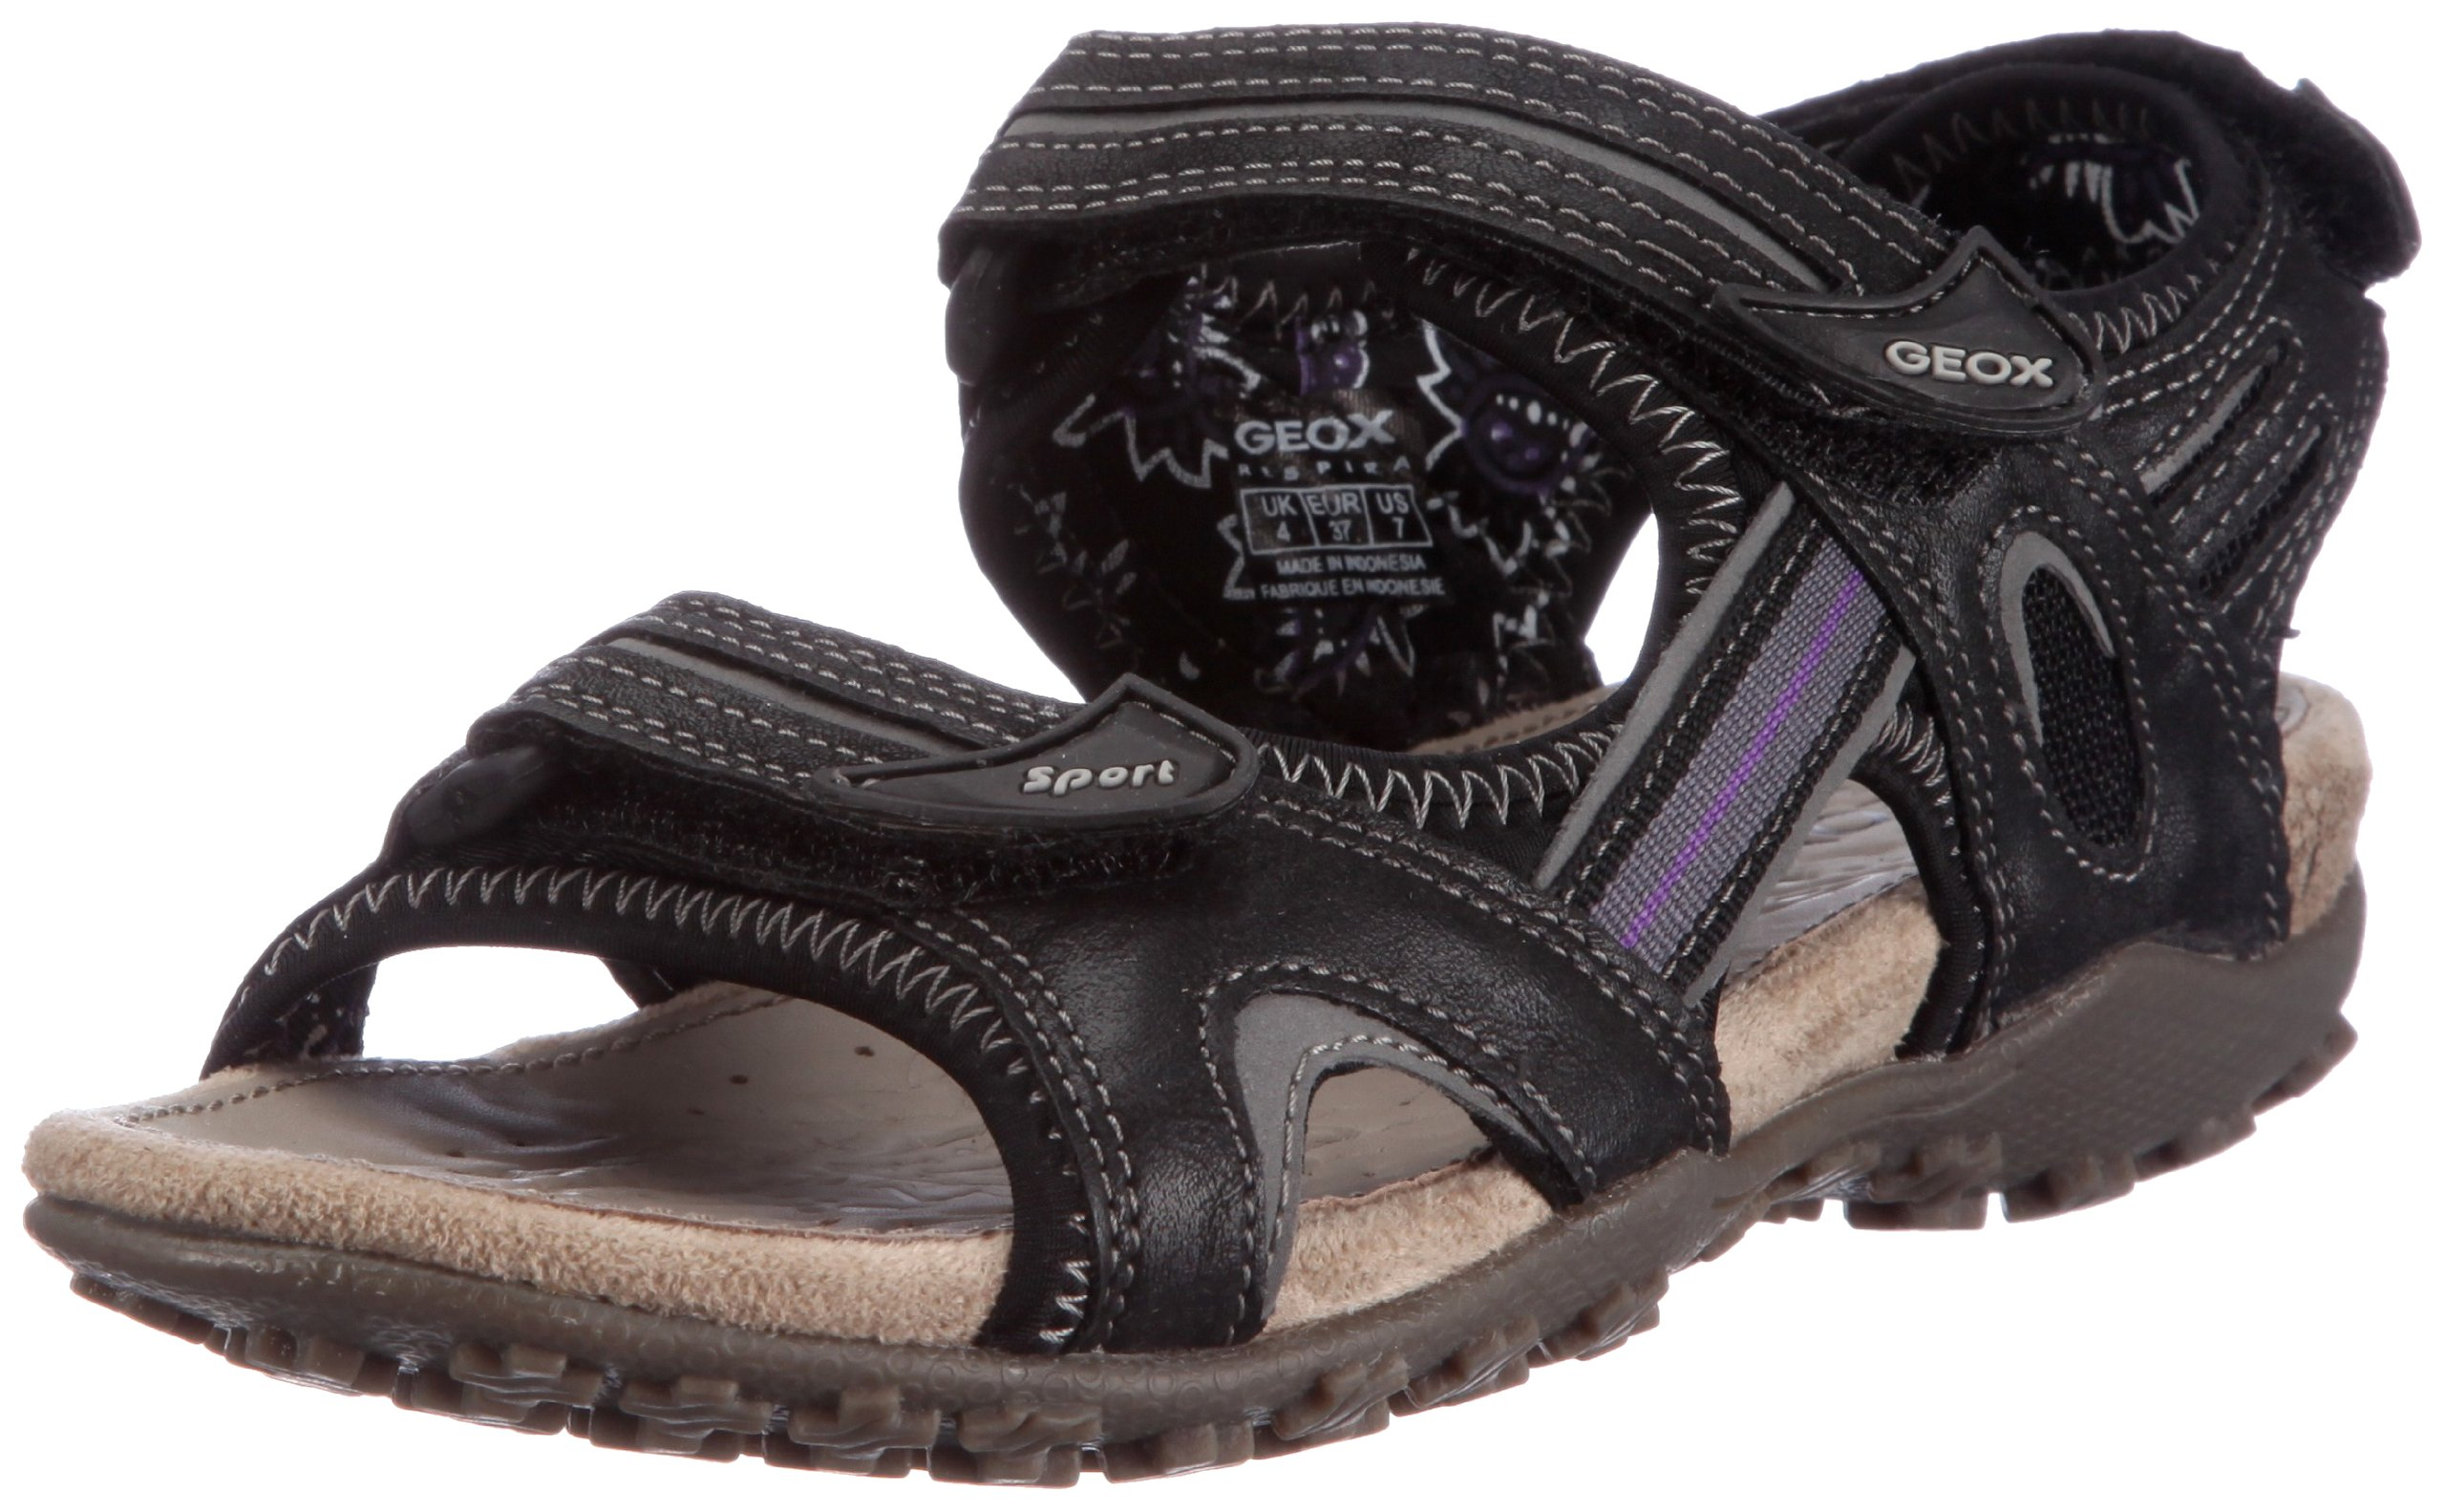 Geox Donna Strel D1125C05415C9999 Damen Sandalen/Fashion-Sandalen 1